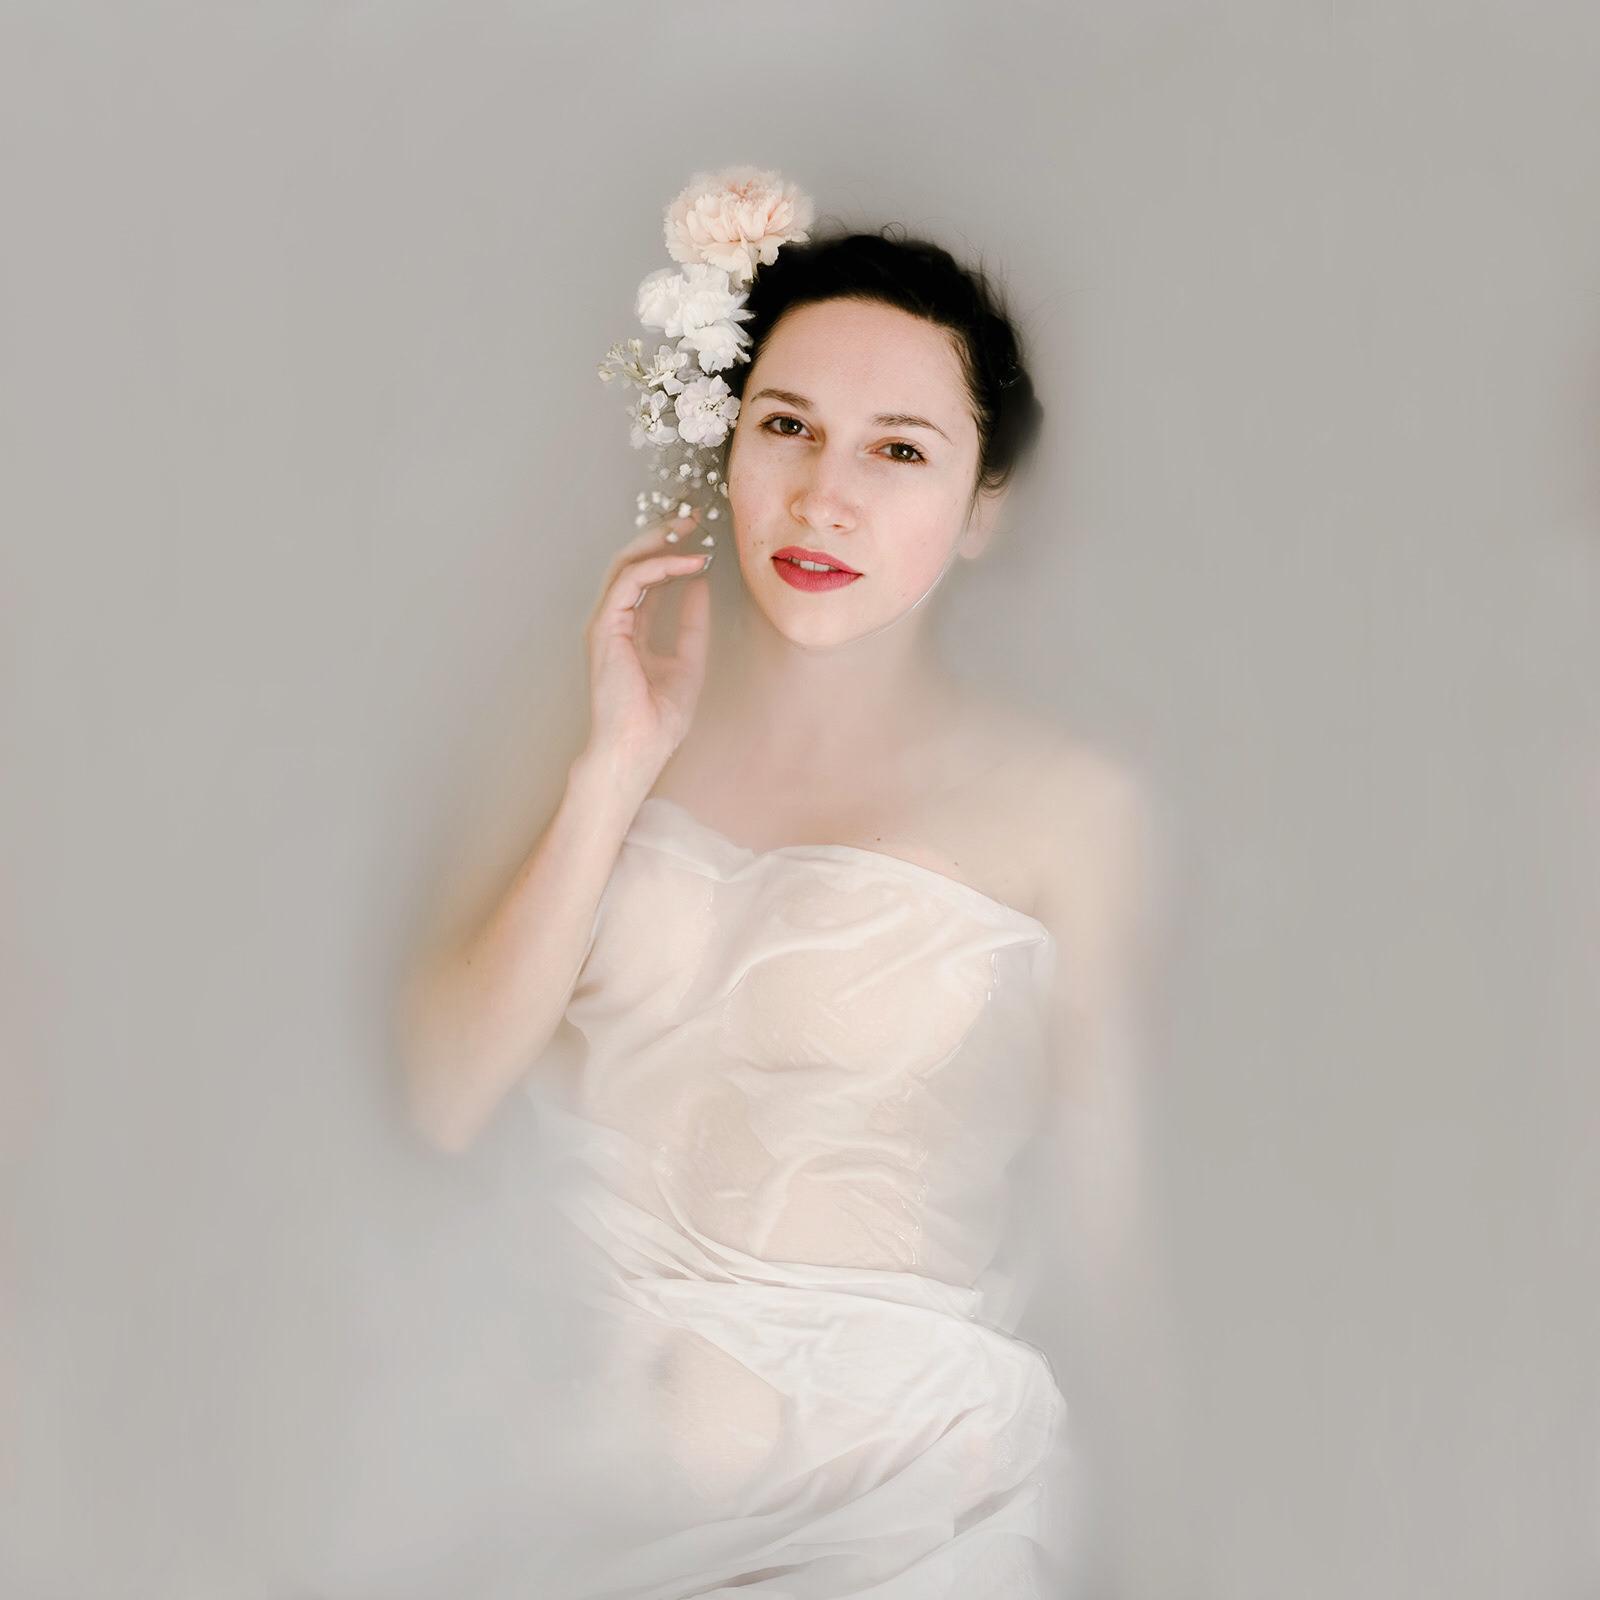 Goddess Milk Bath Portrait of Anastasia by Jaclyn Le